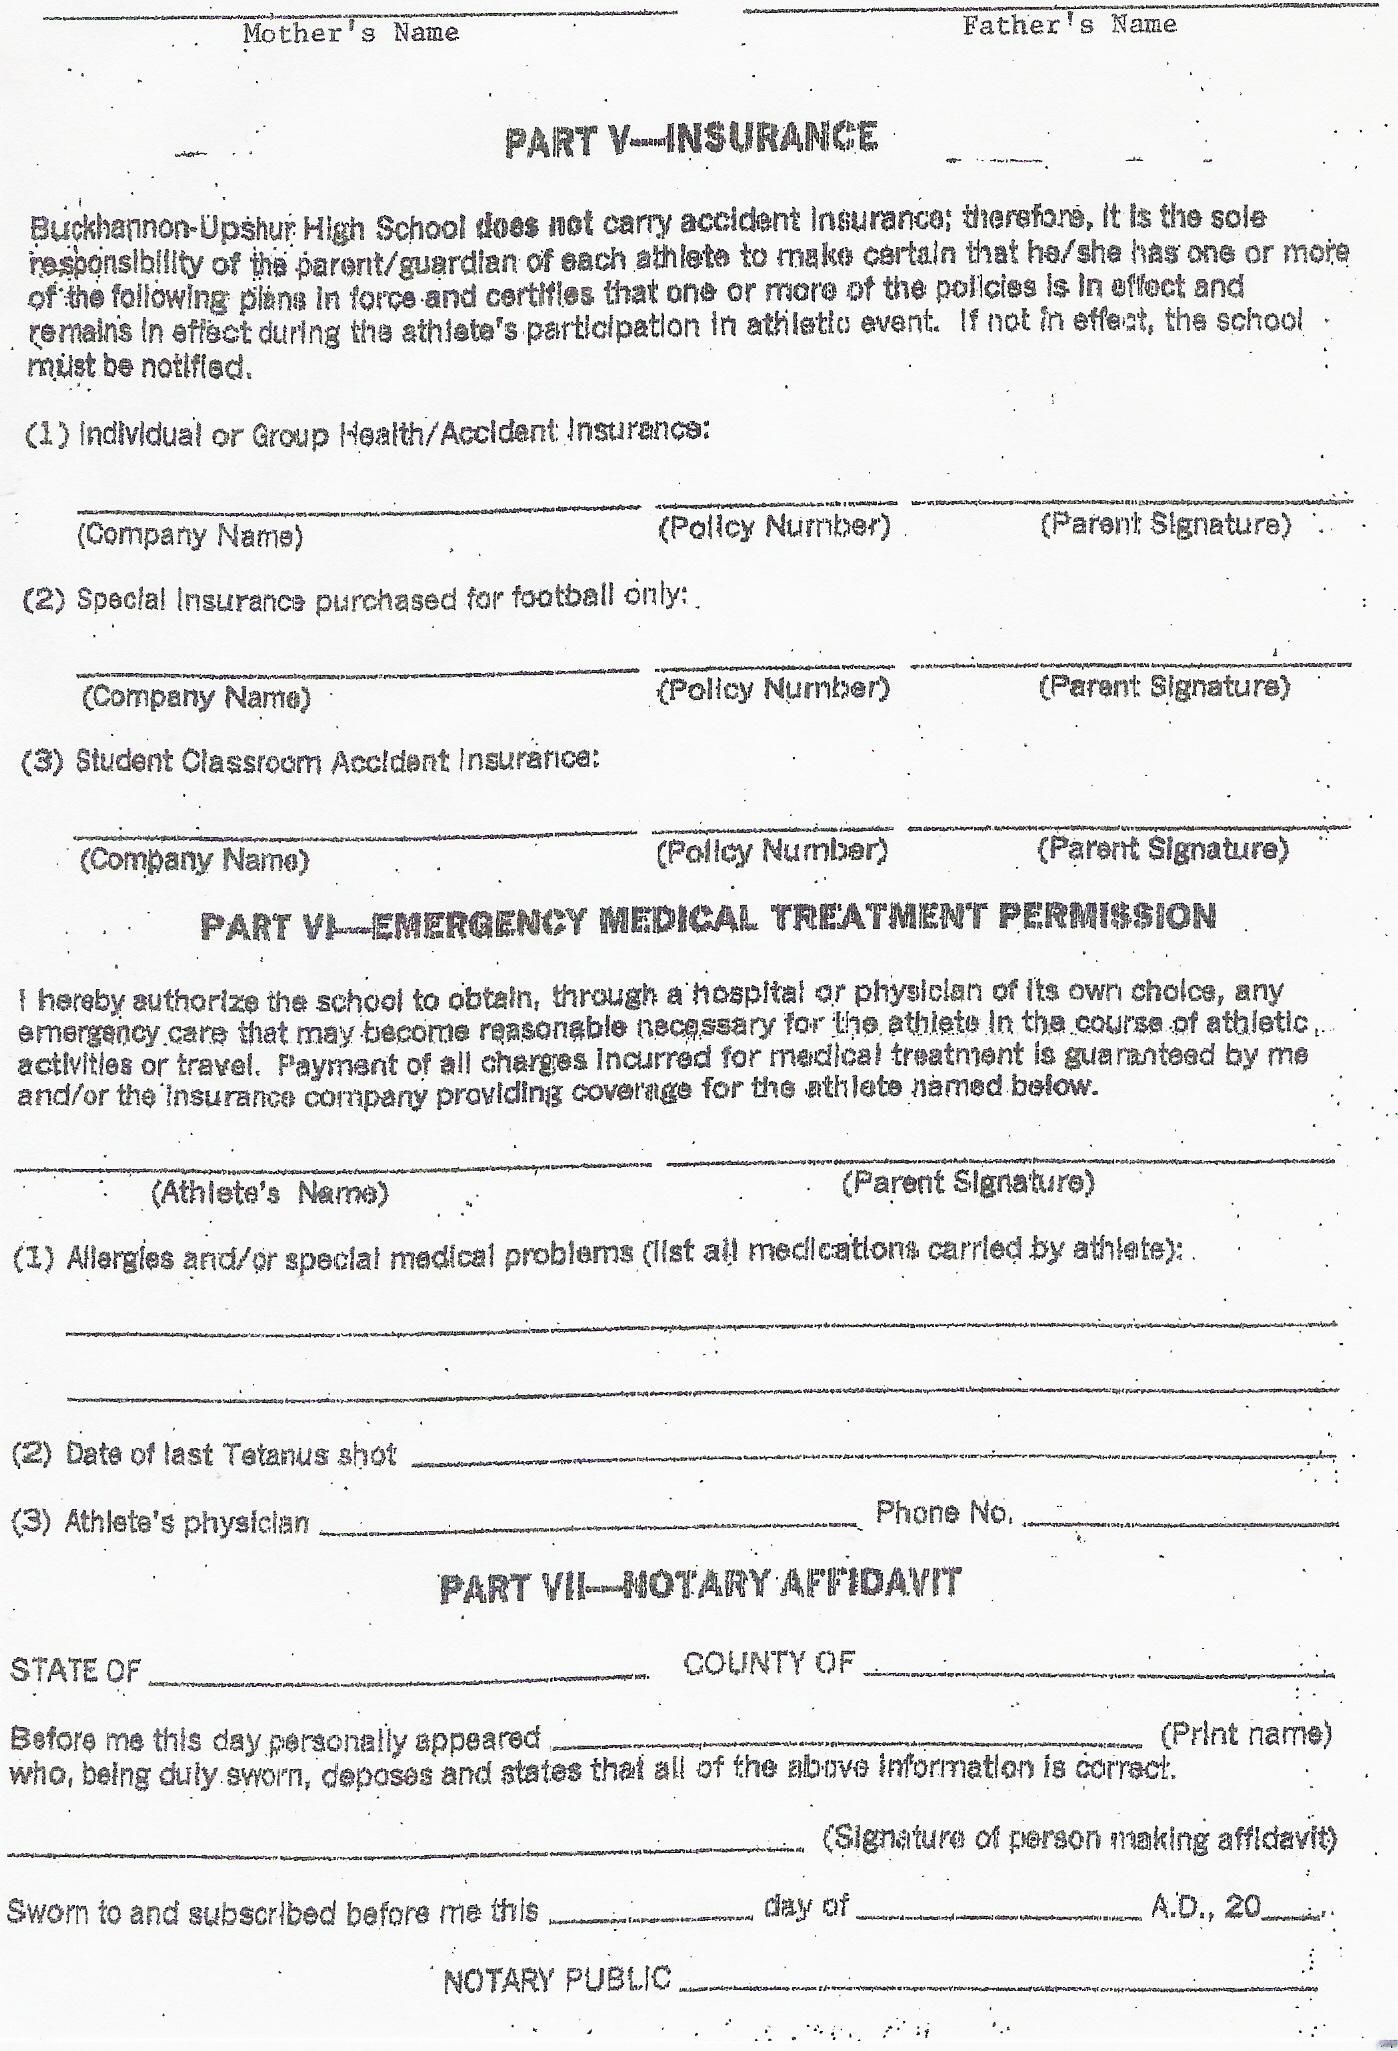 sample insurance form Fill Online, Printable, Fillable, Blank